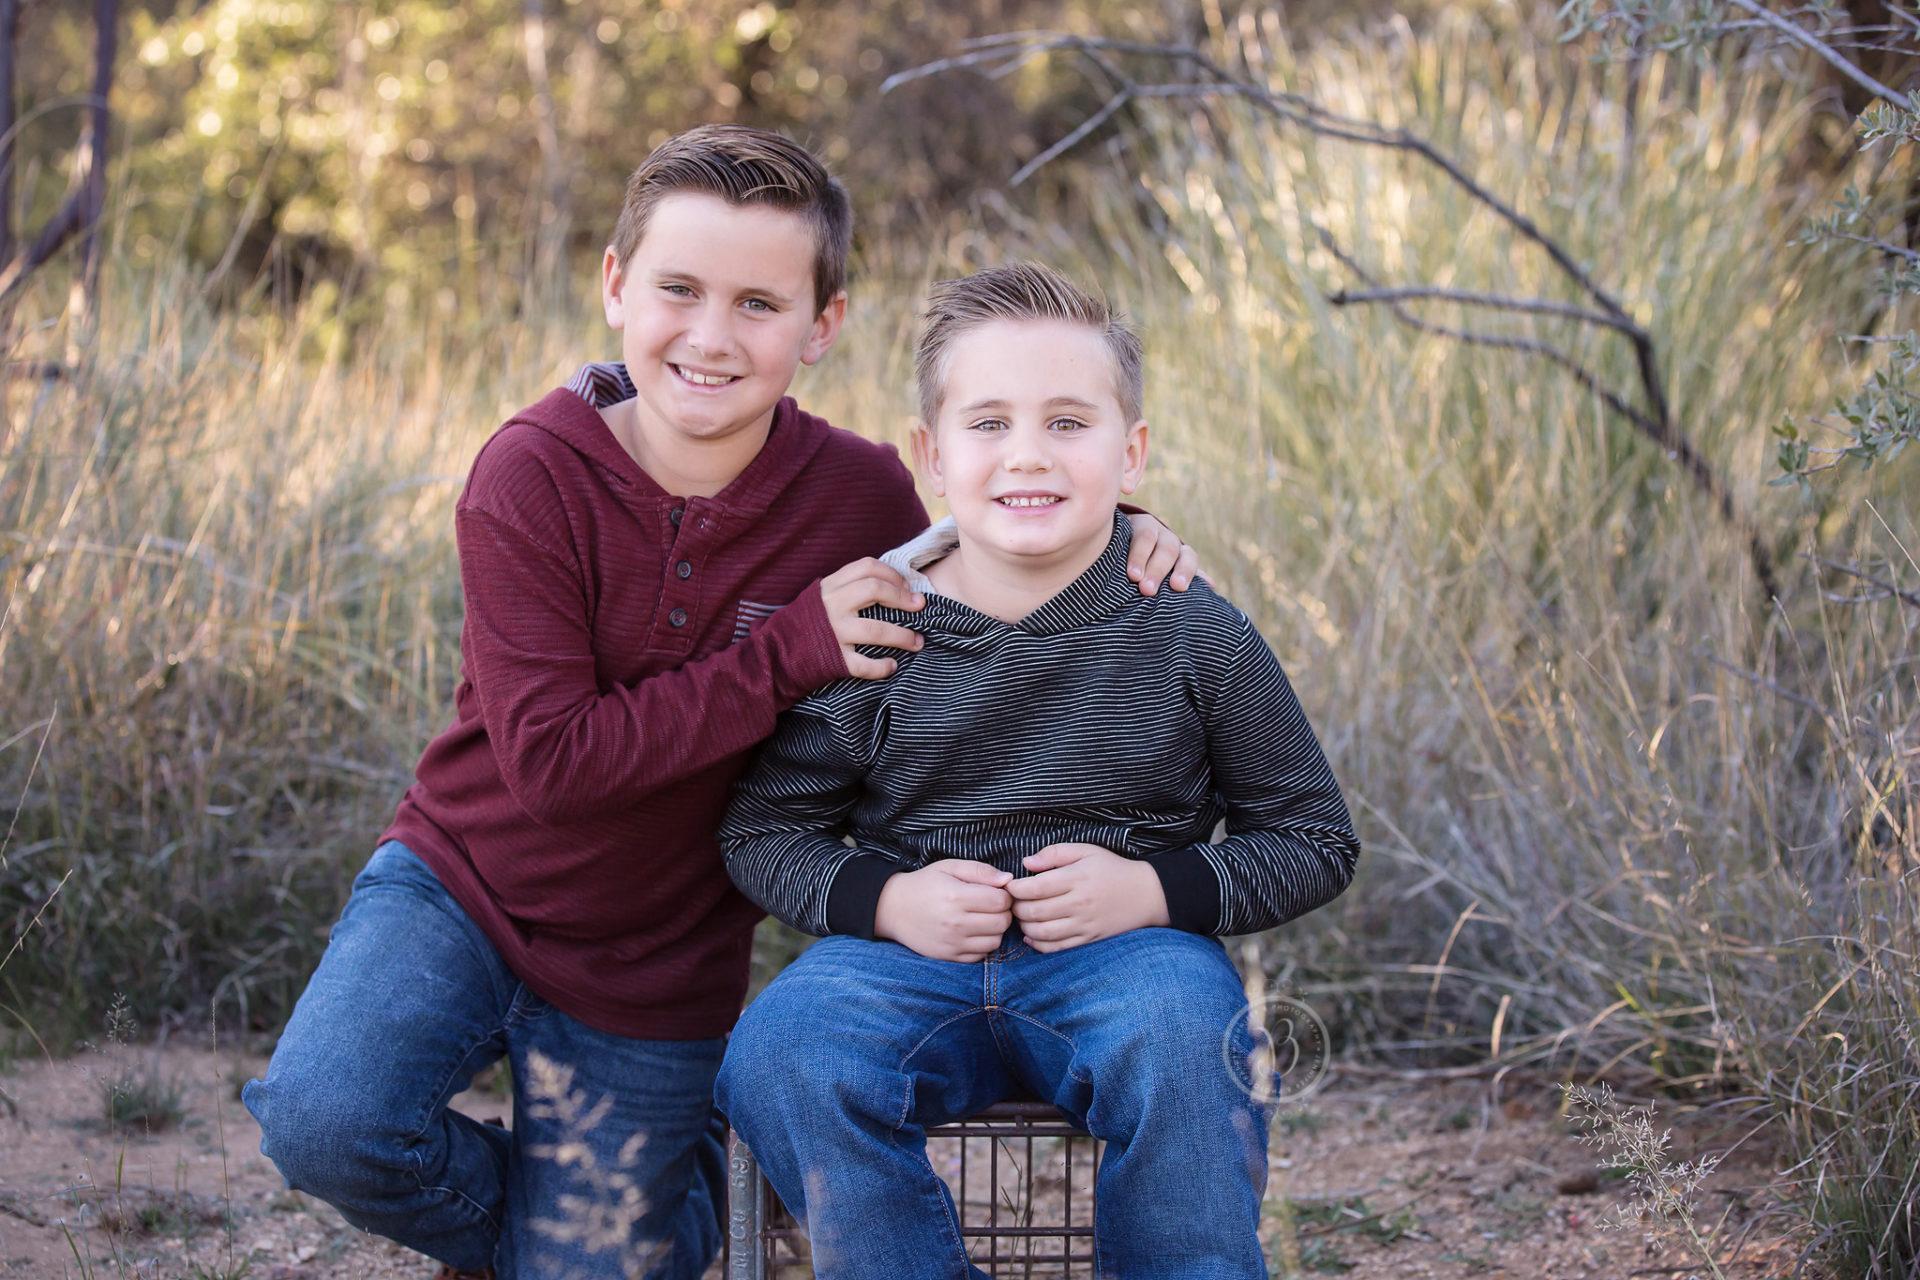 Tucson kids photographer